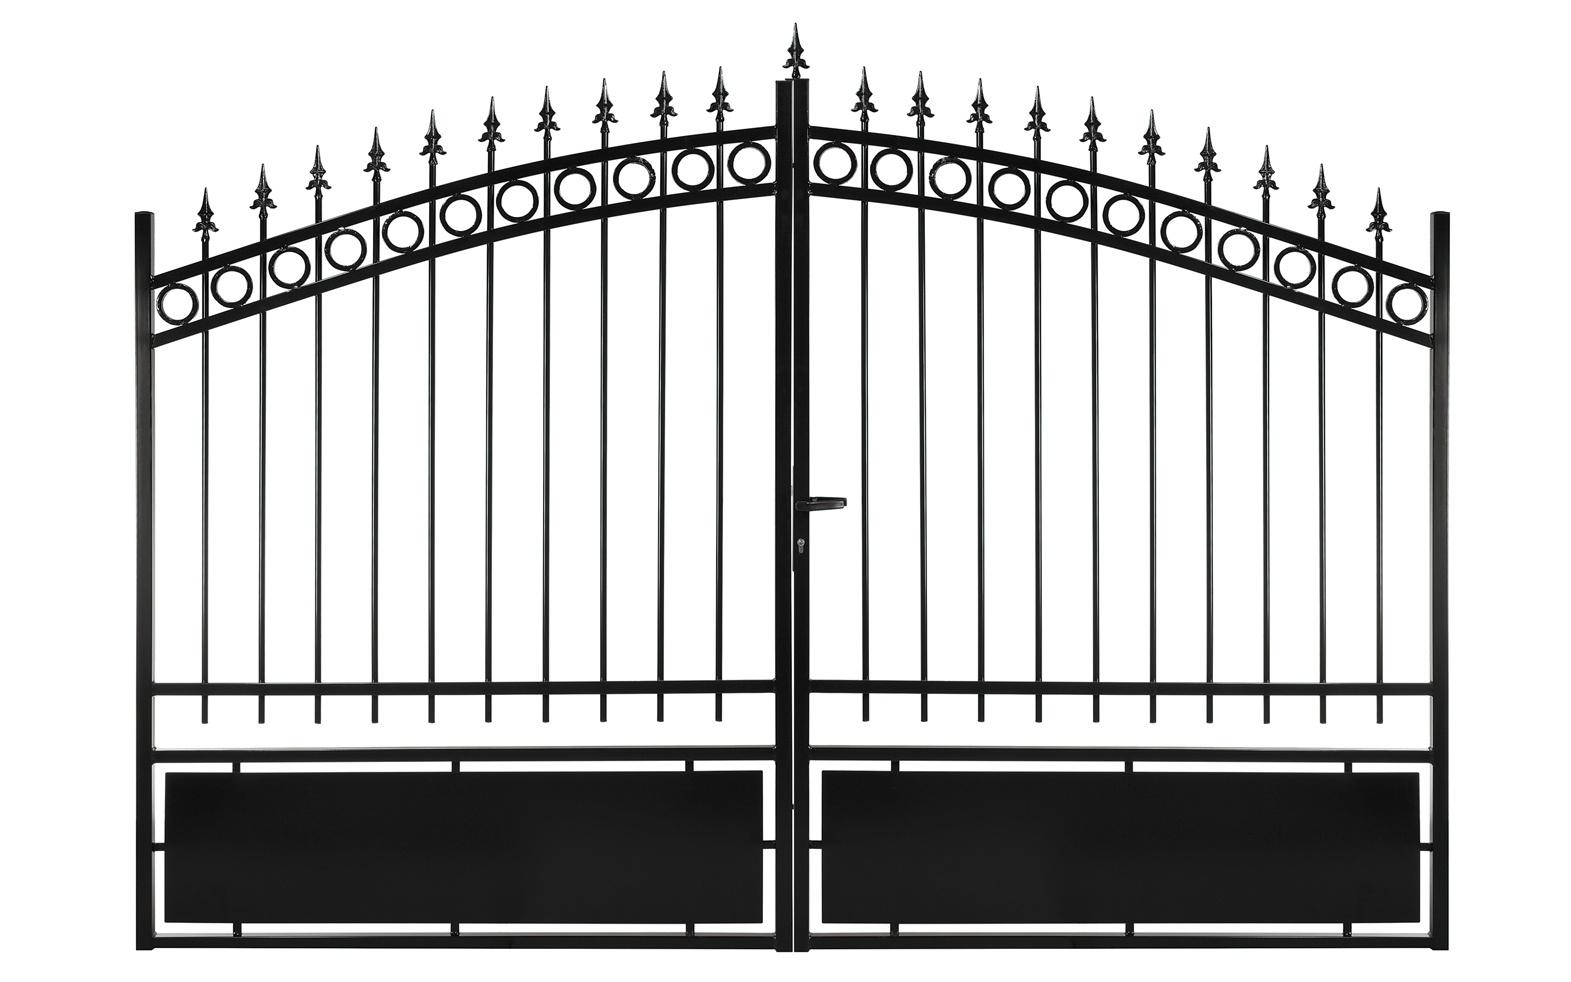 Le ferronnier gamme eco portail en fer forg mod le 2 poportail02 for Modele portail fer forge